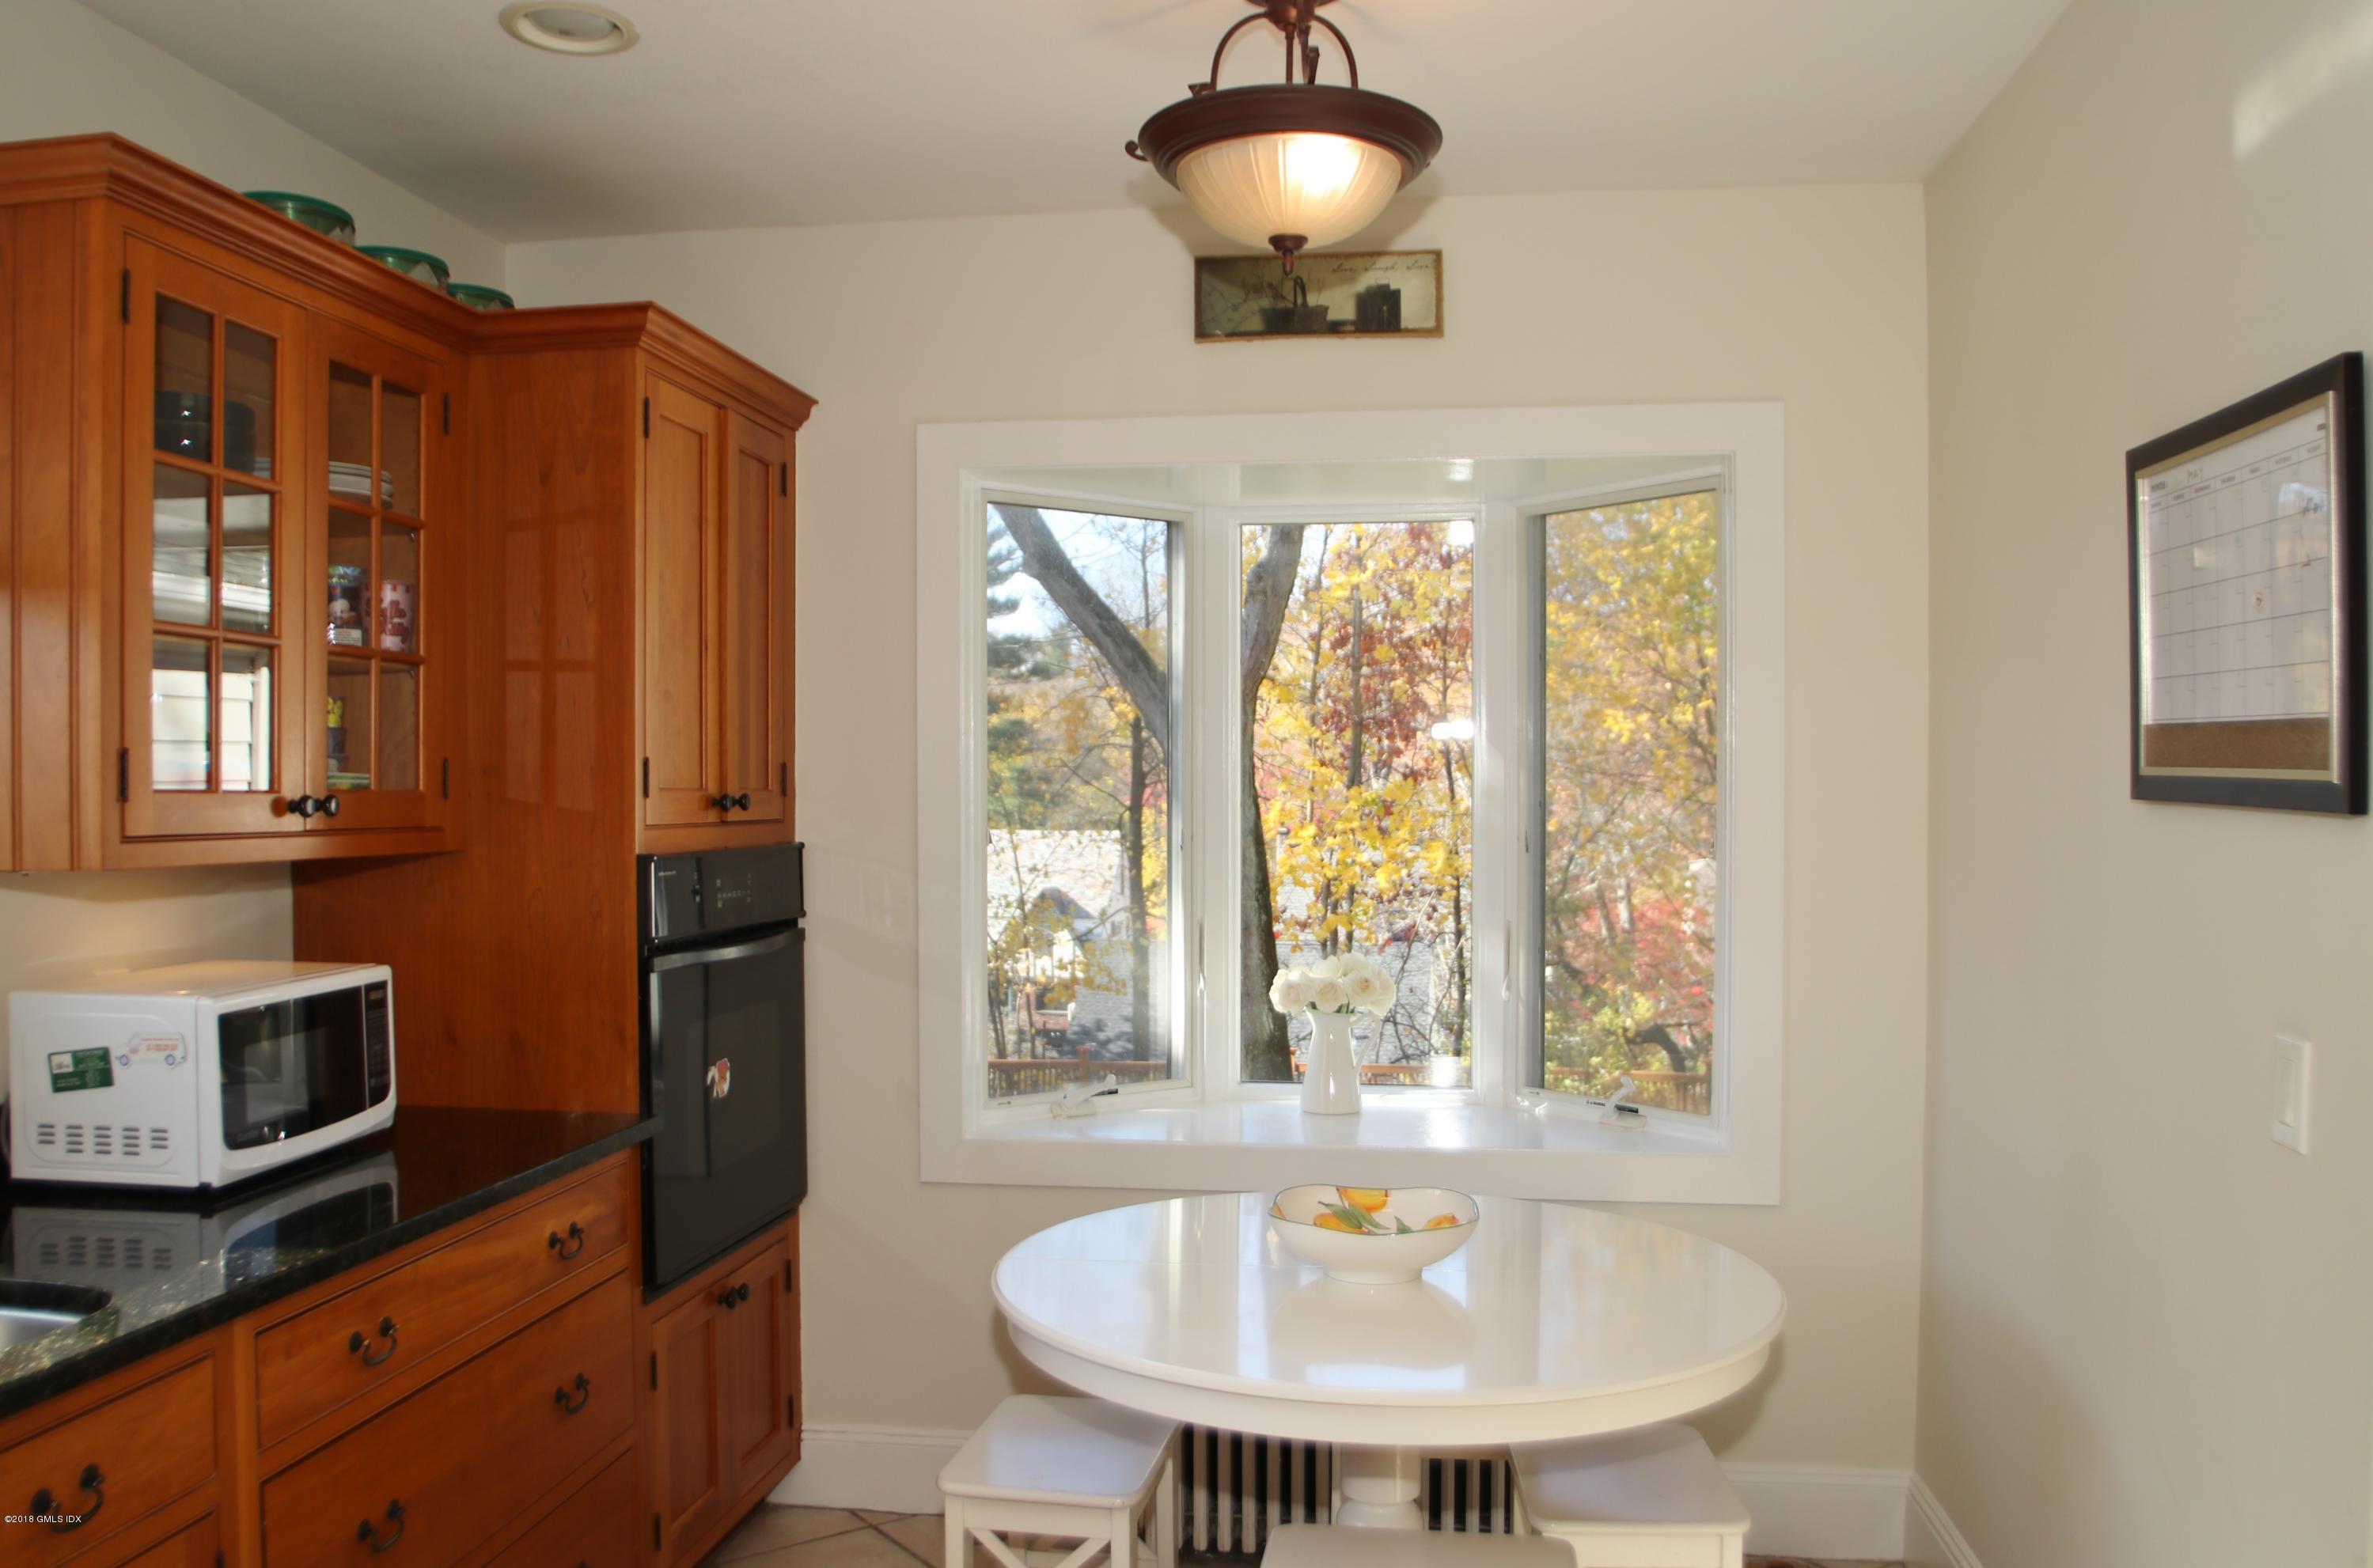 10 Ridge Road,Cos Cob,Connecticut 06807,5 Bedrooms Bedrooms,3 BathroomsBathrooms,Single family,Ridge,106972